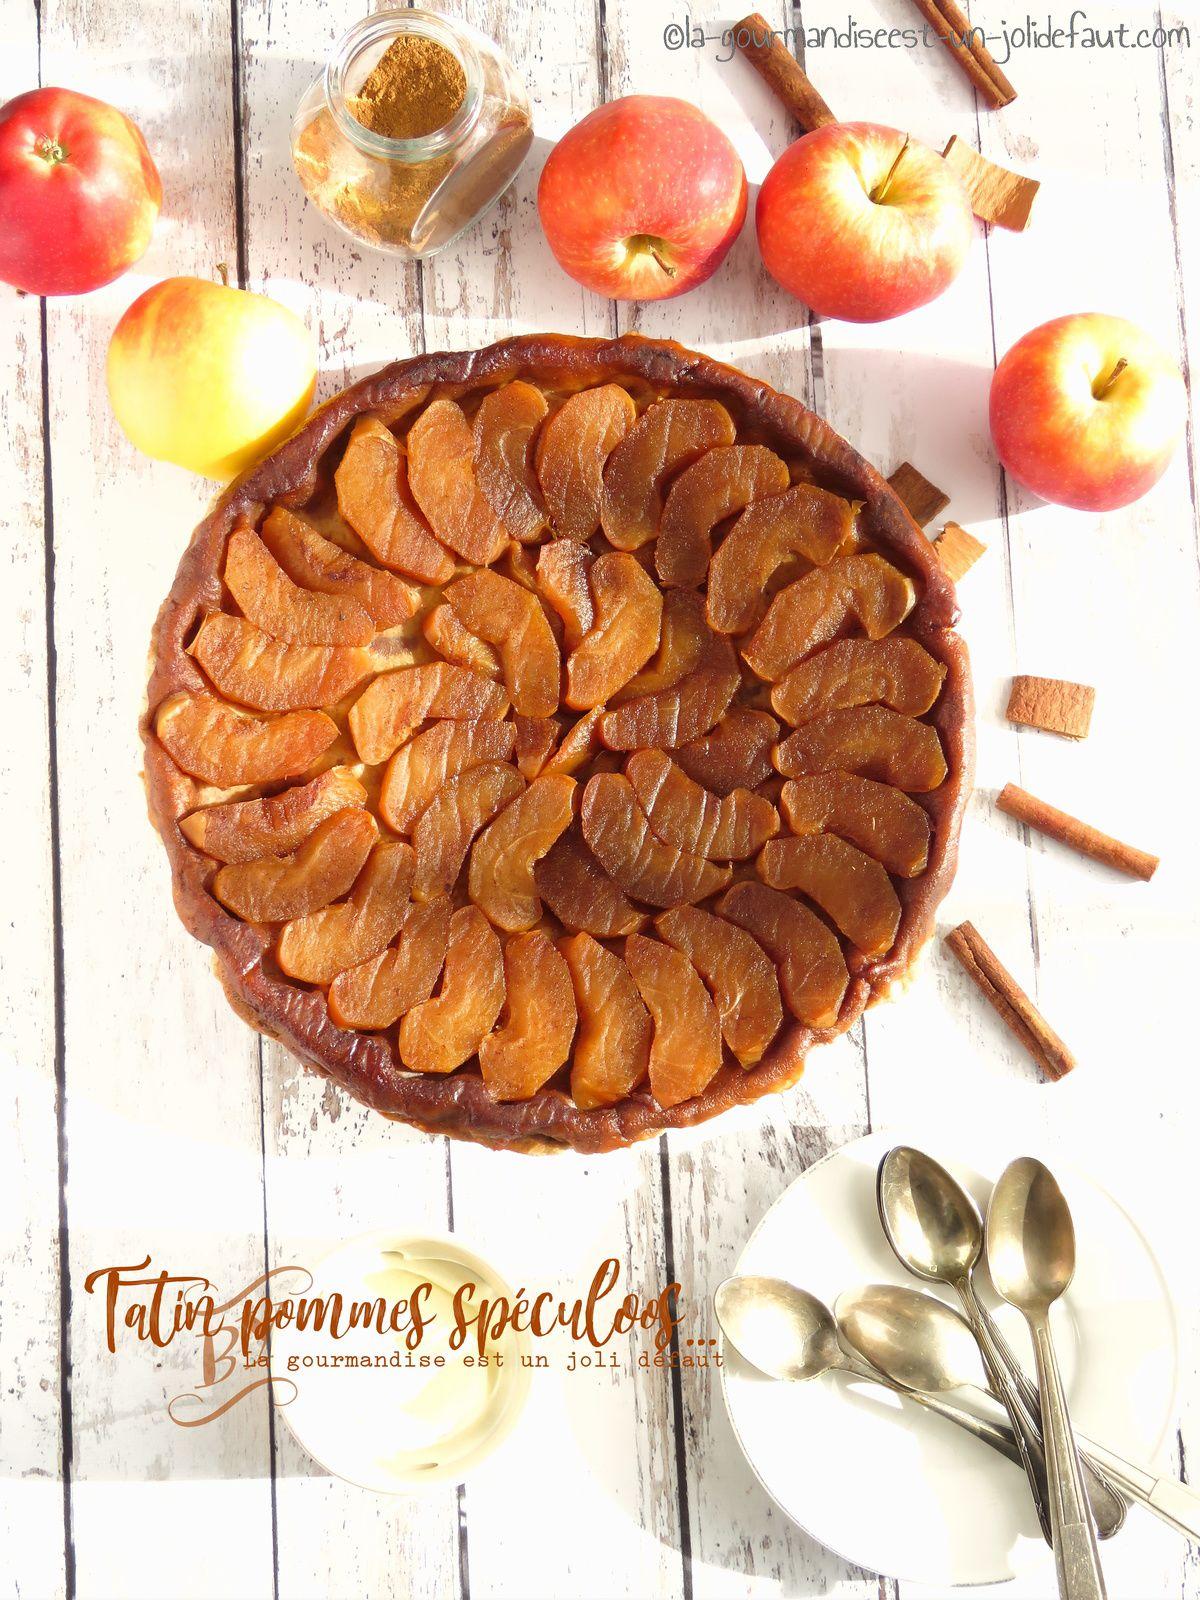 Tarte tatin aux pommes saveur spéculoos